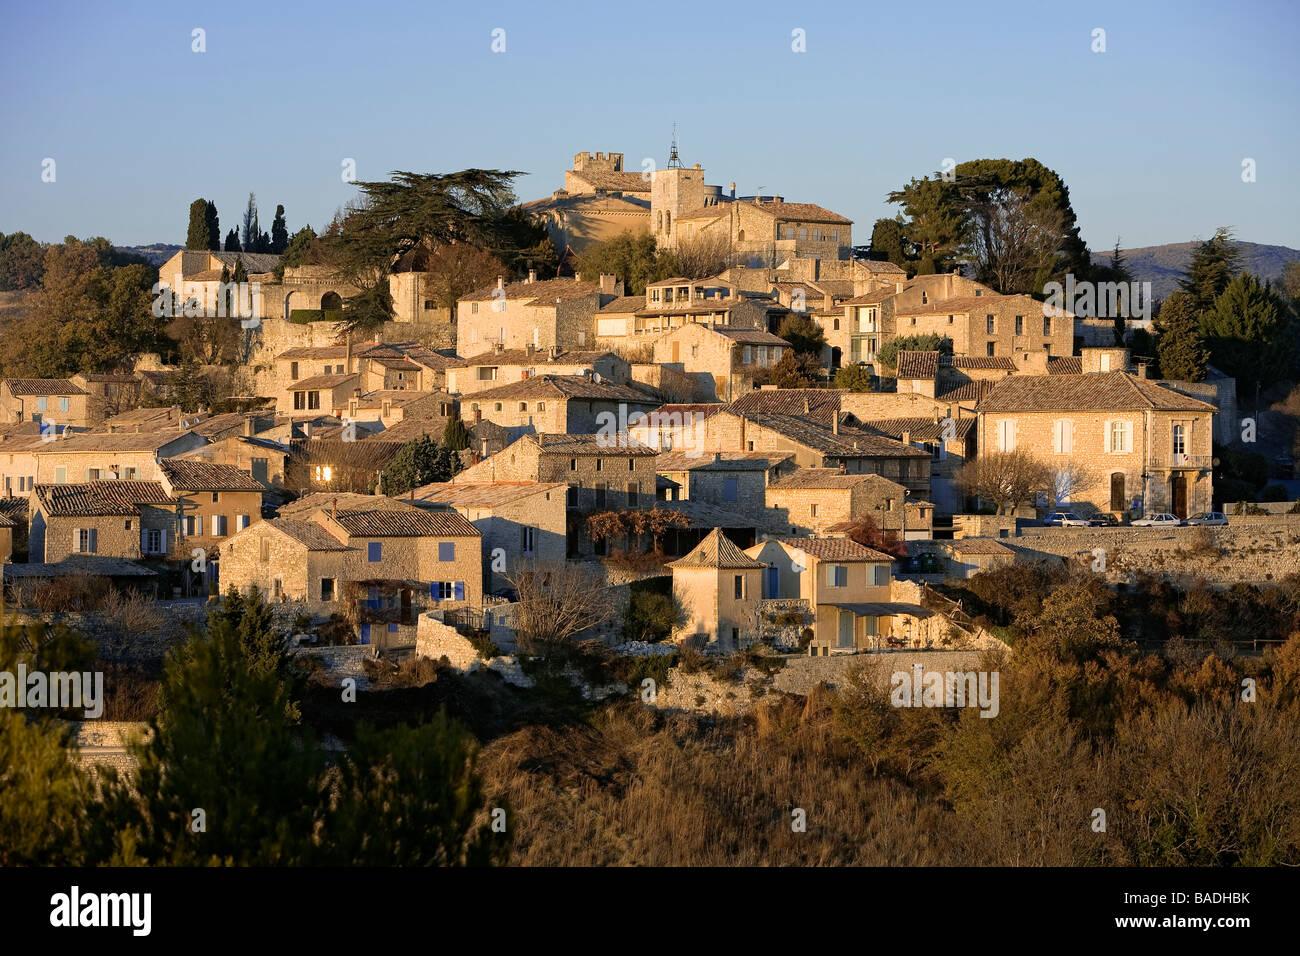 Murs provence